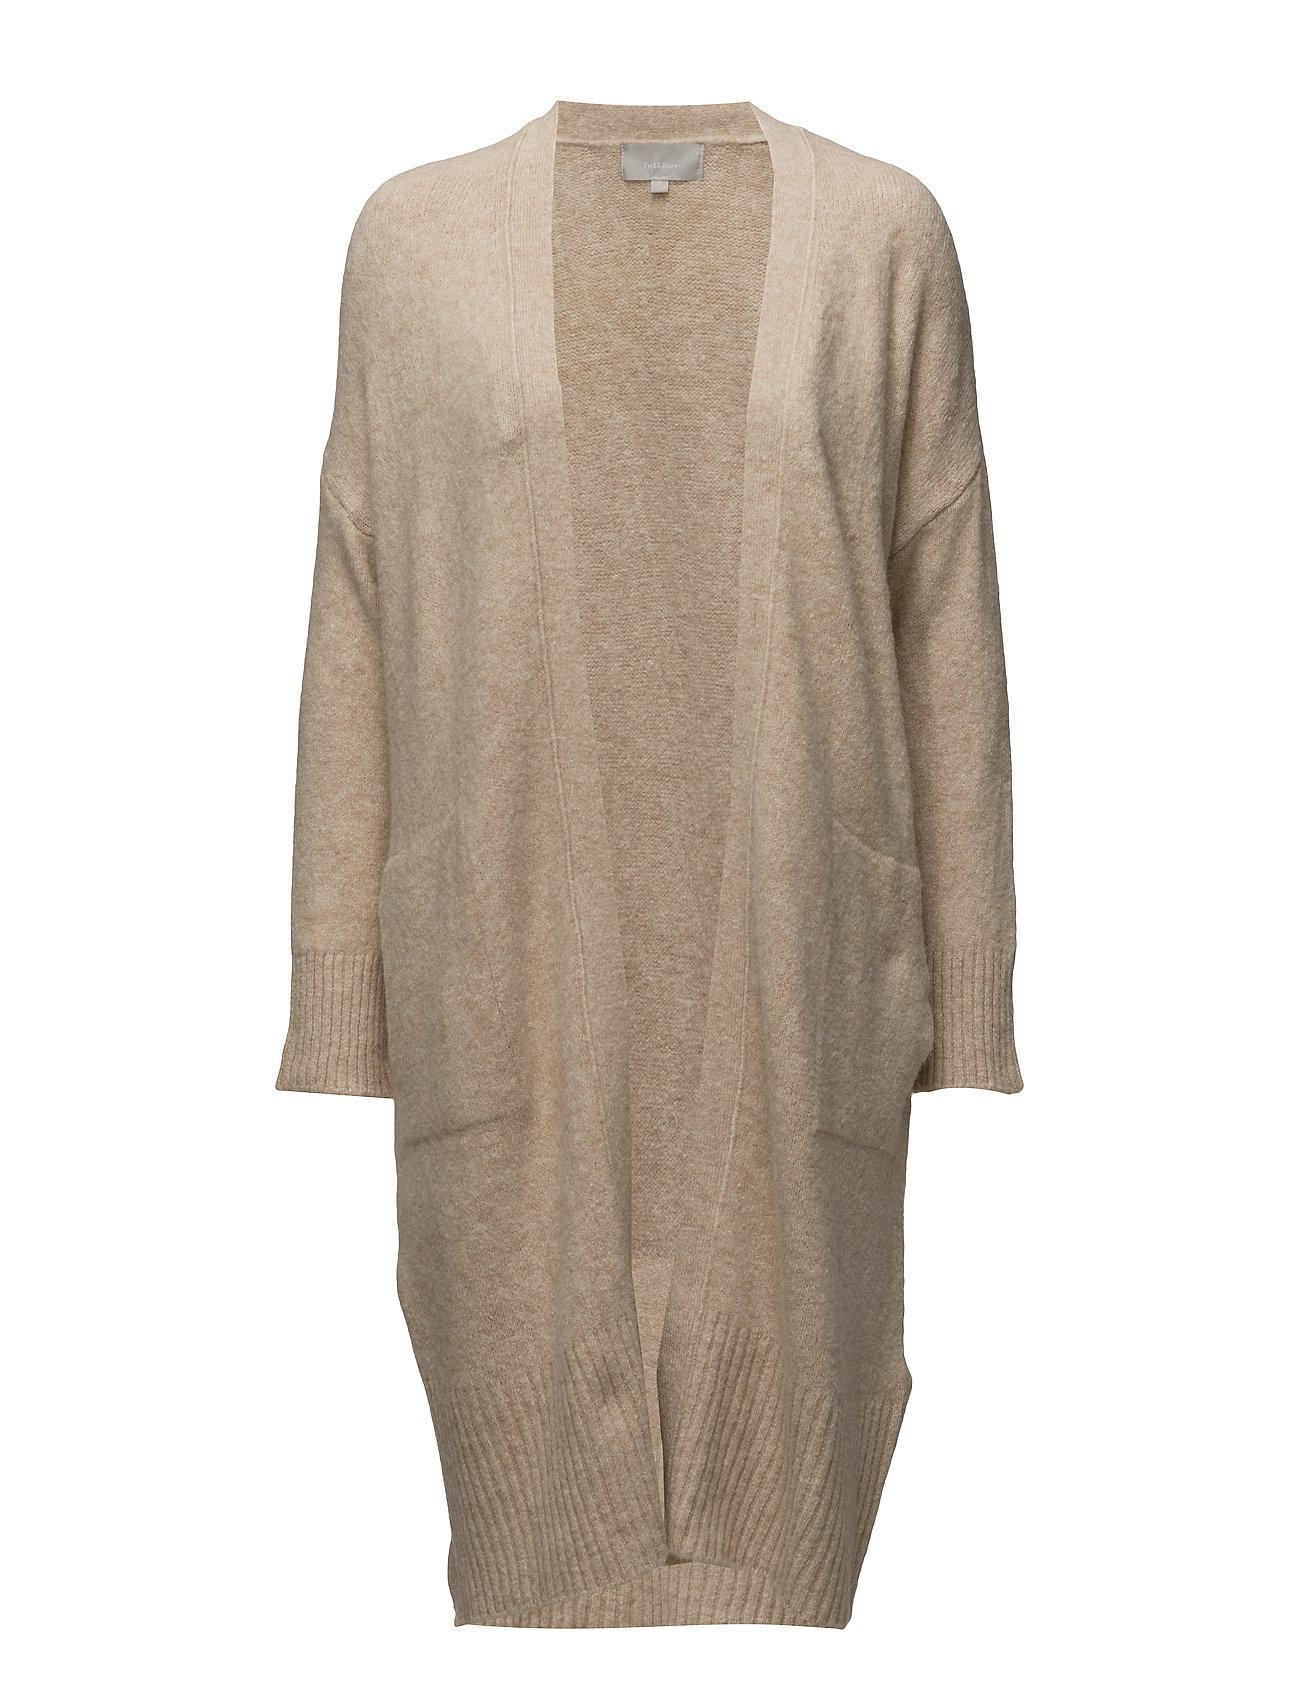 Yasu Cardigan Knit InWear Cardigans til Damer i Pulver Beige